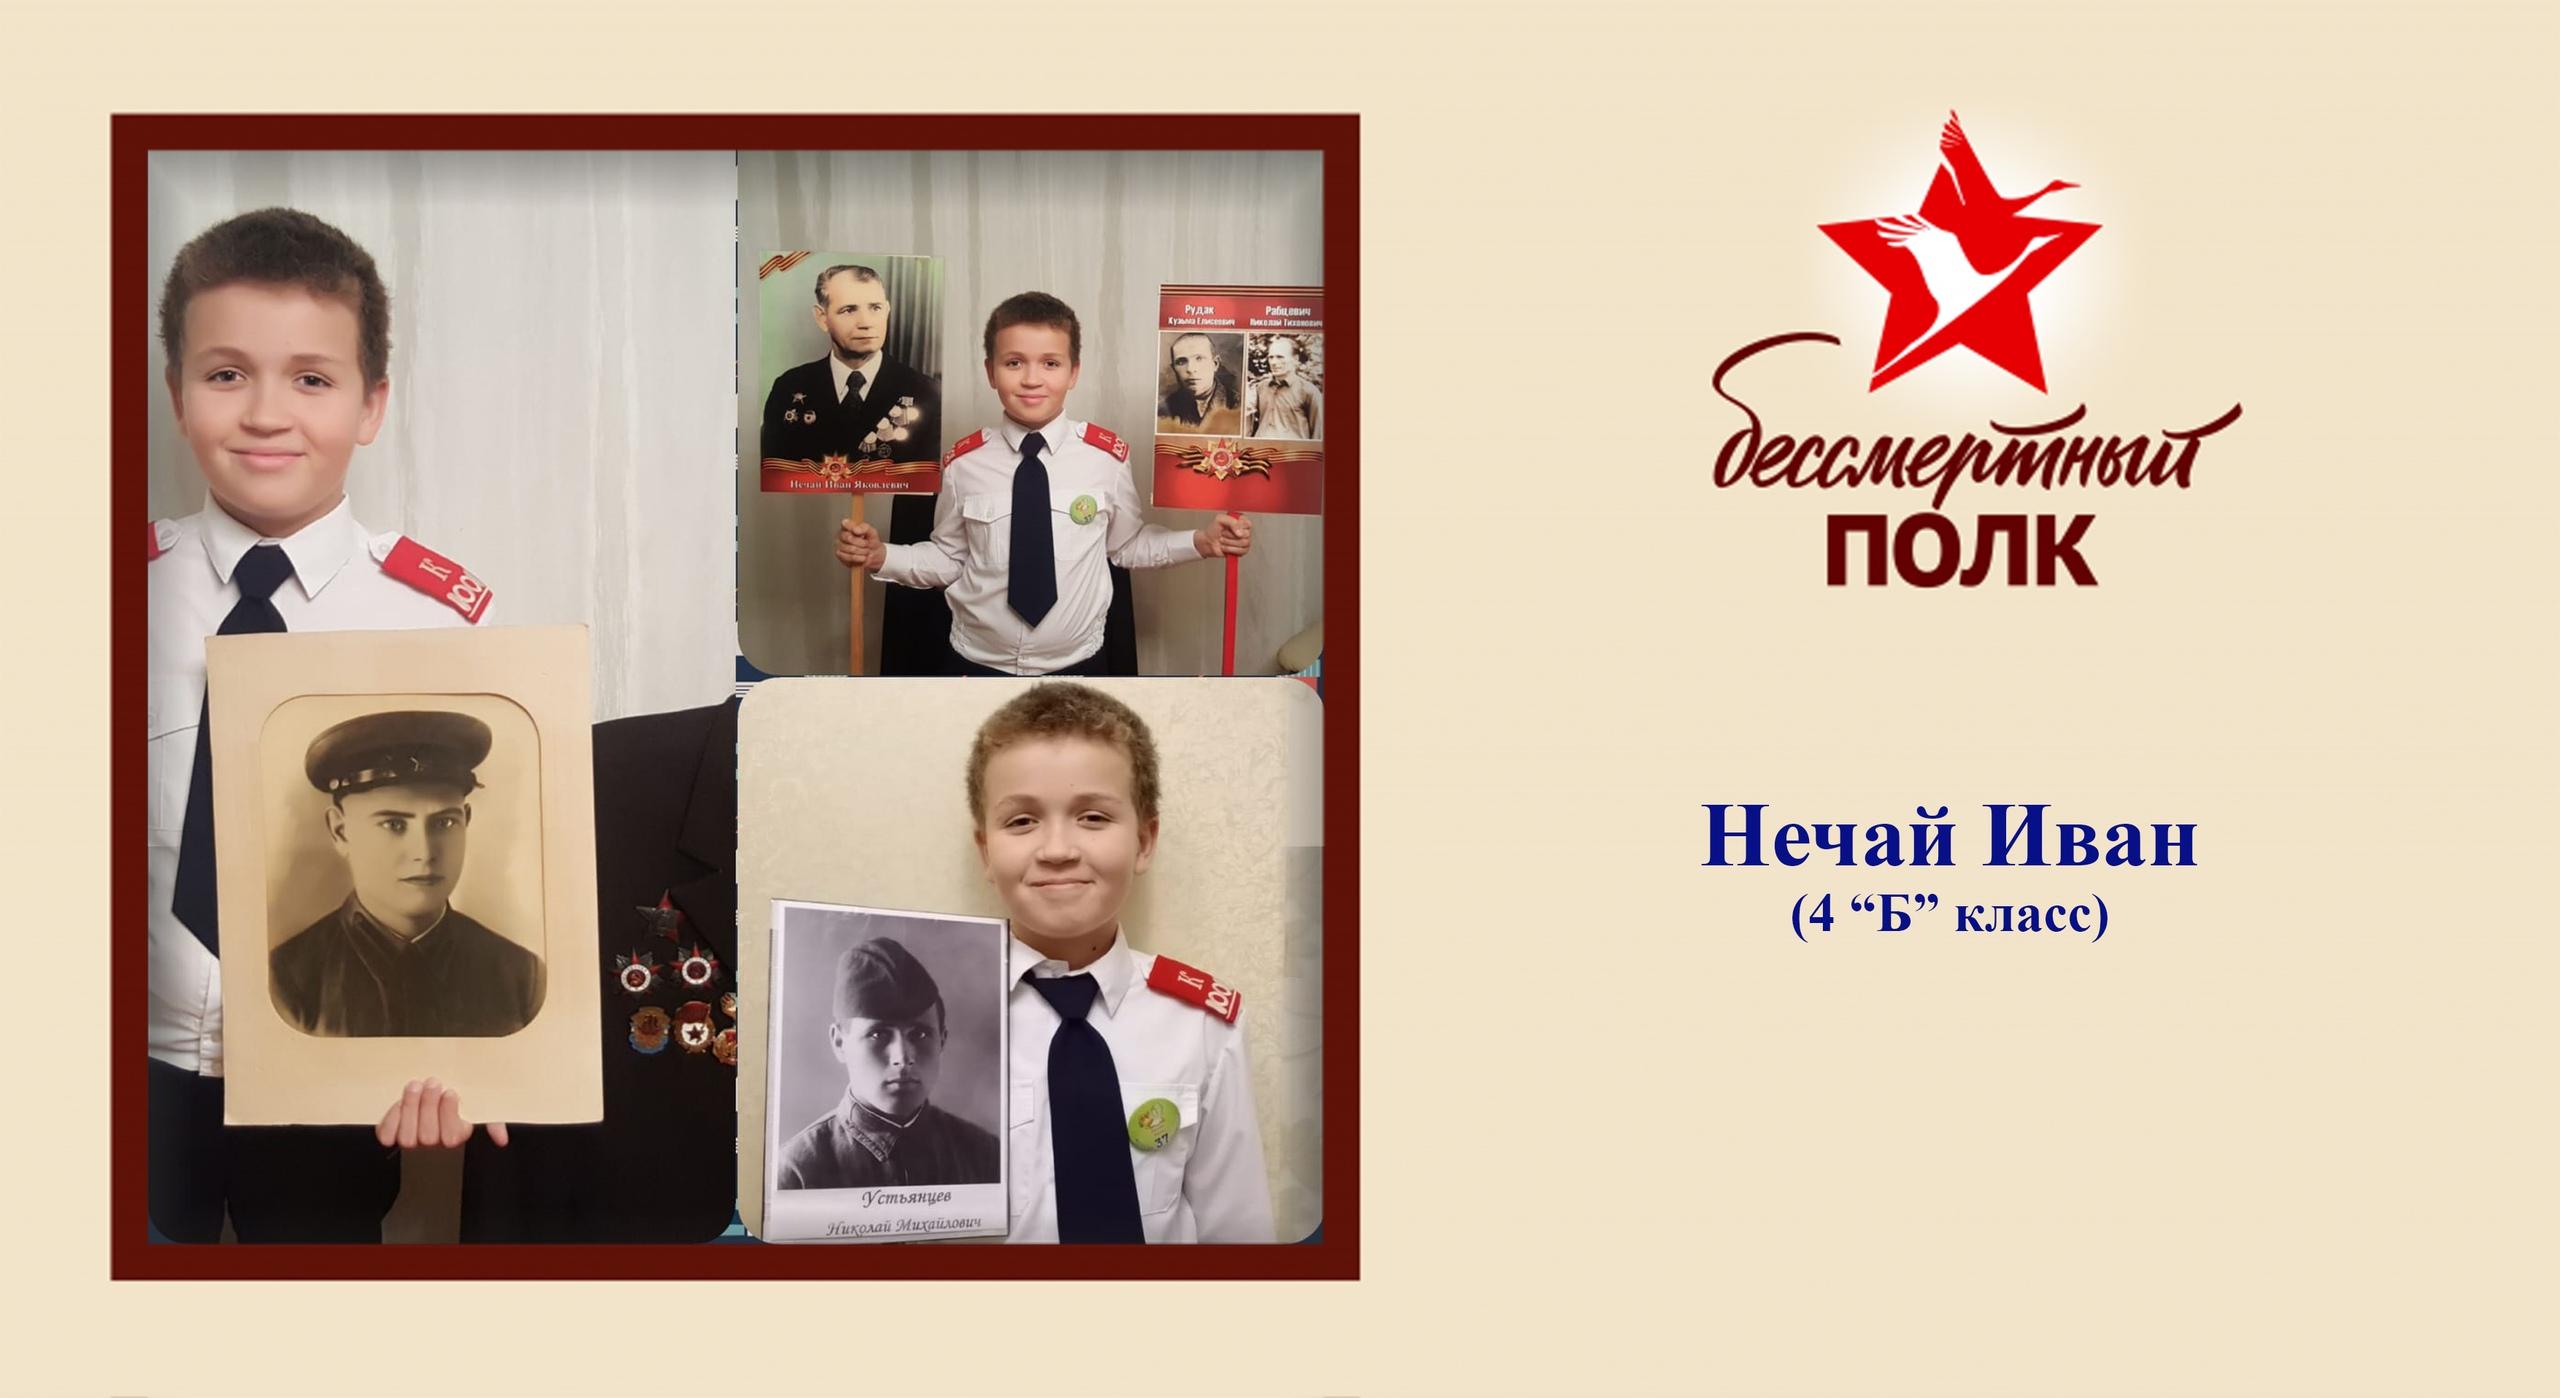 Нечай Иван